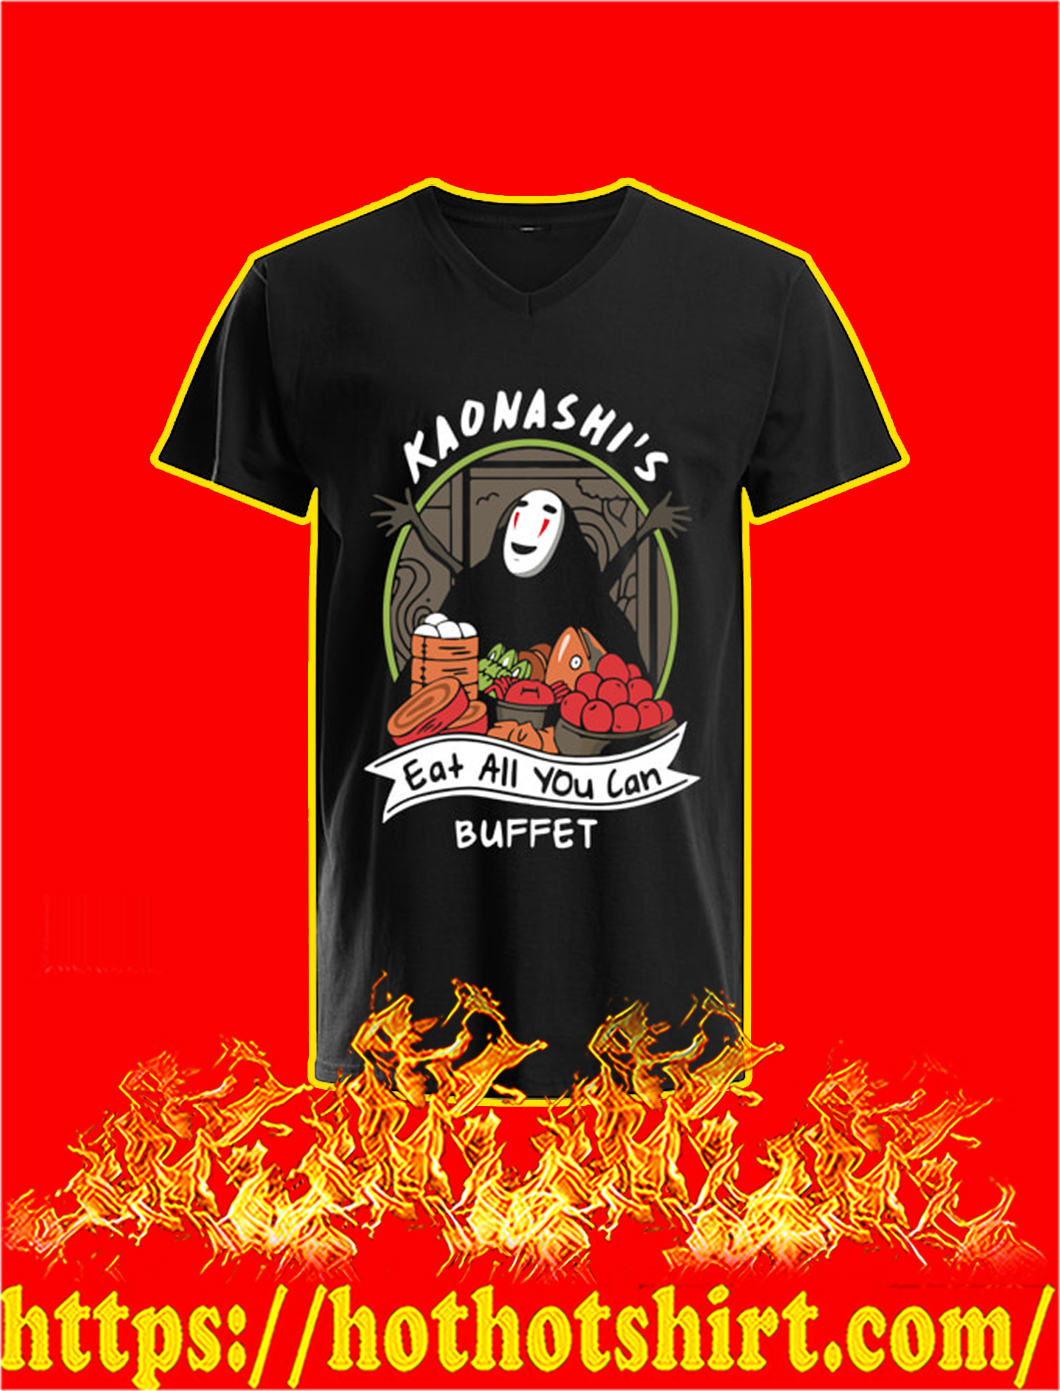 Kaonashi's Eat All You Can Buffet v-neck